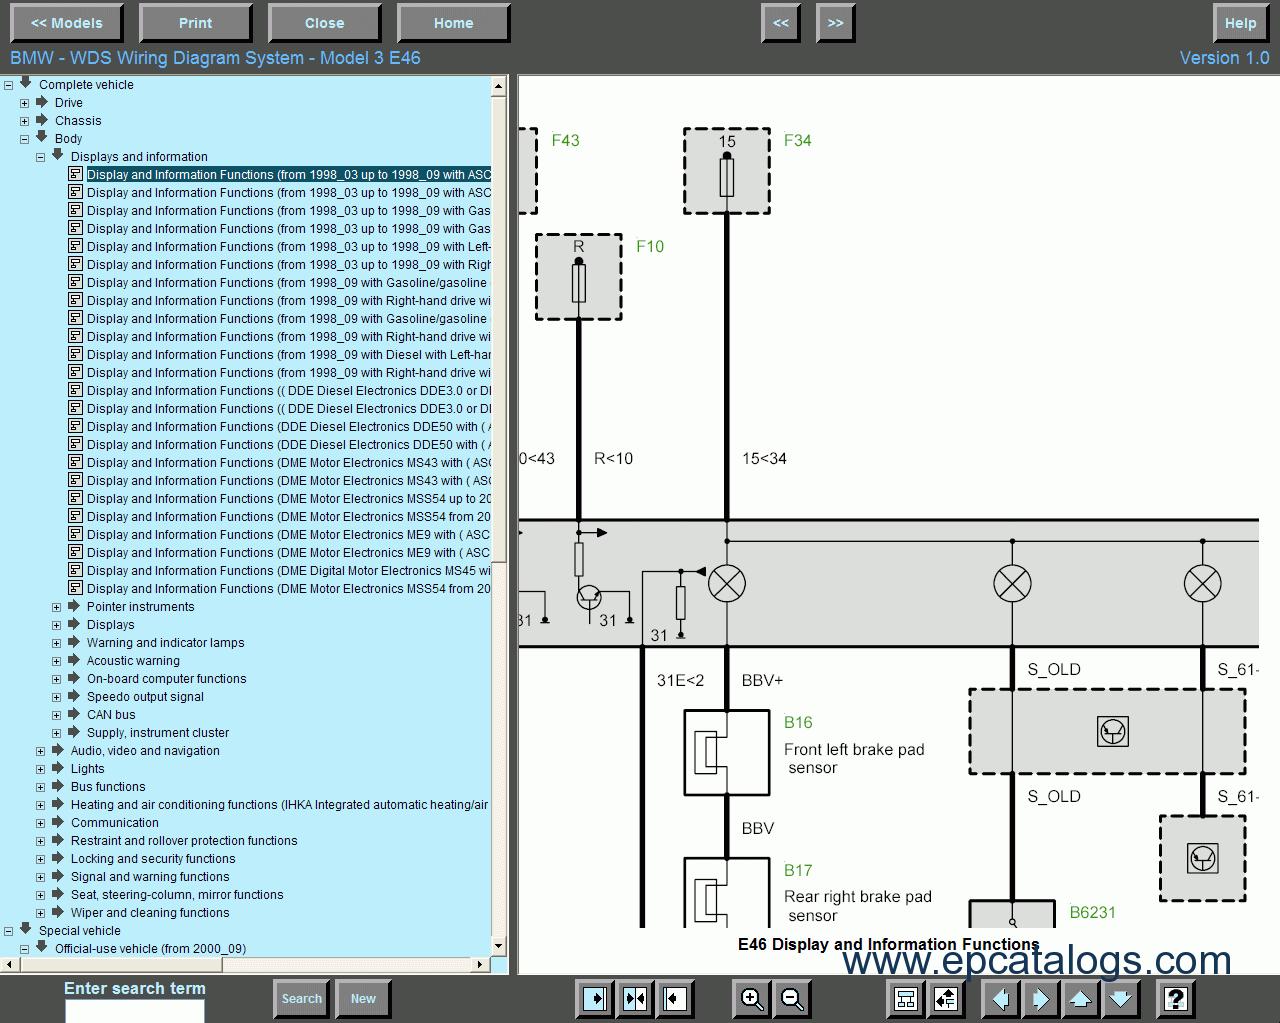 05 Bmw Z4 Airbag Wiring Diagram Wiring Diagram With Description